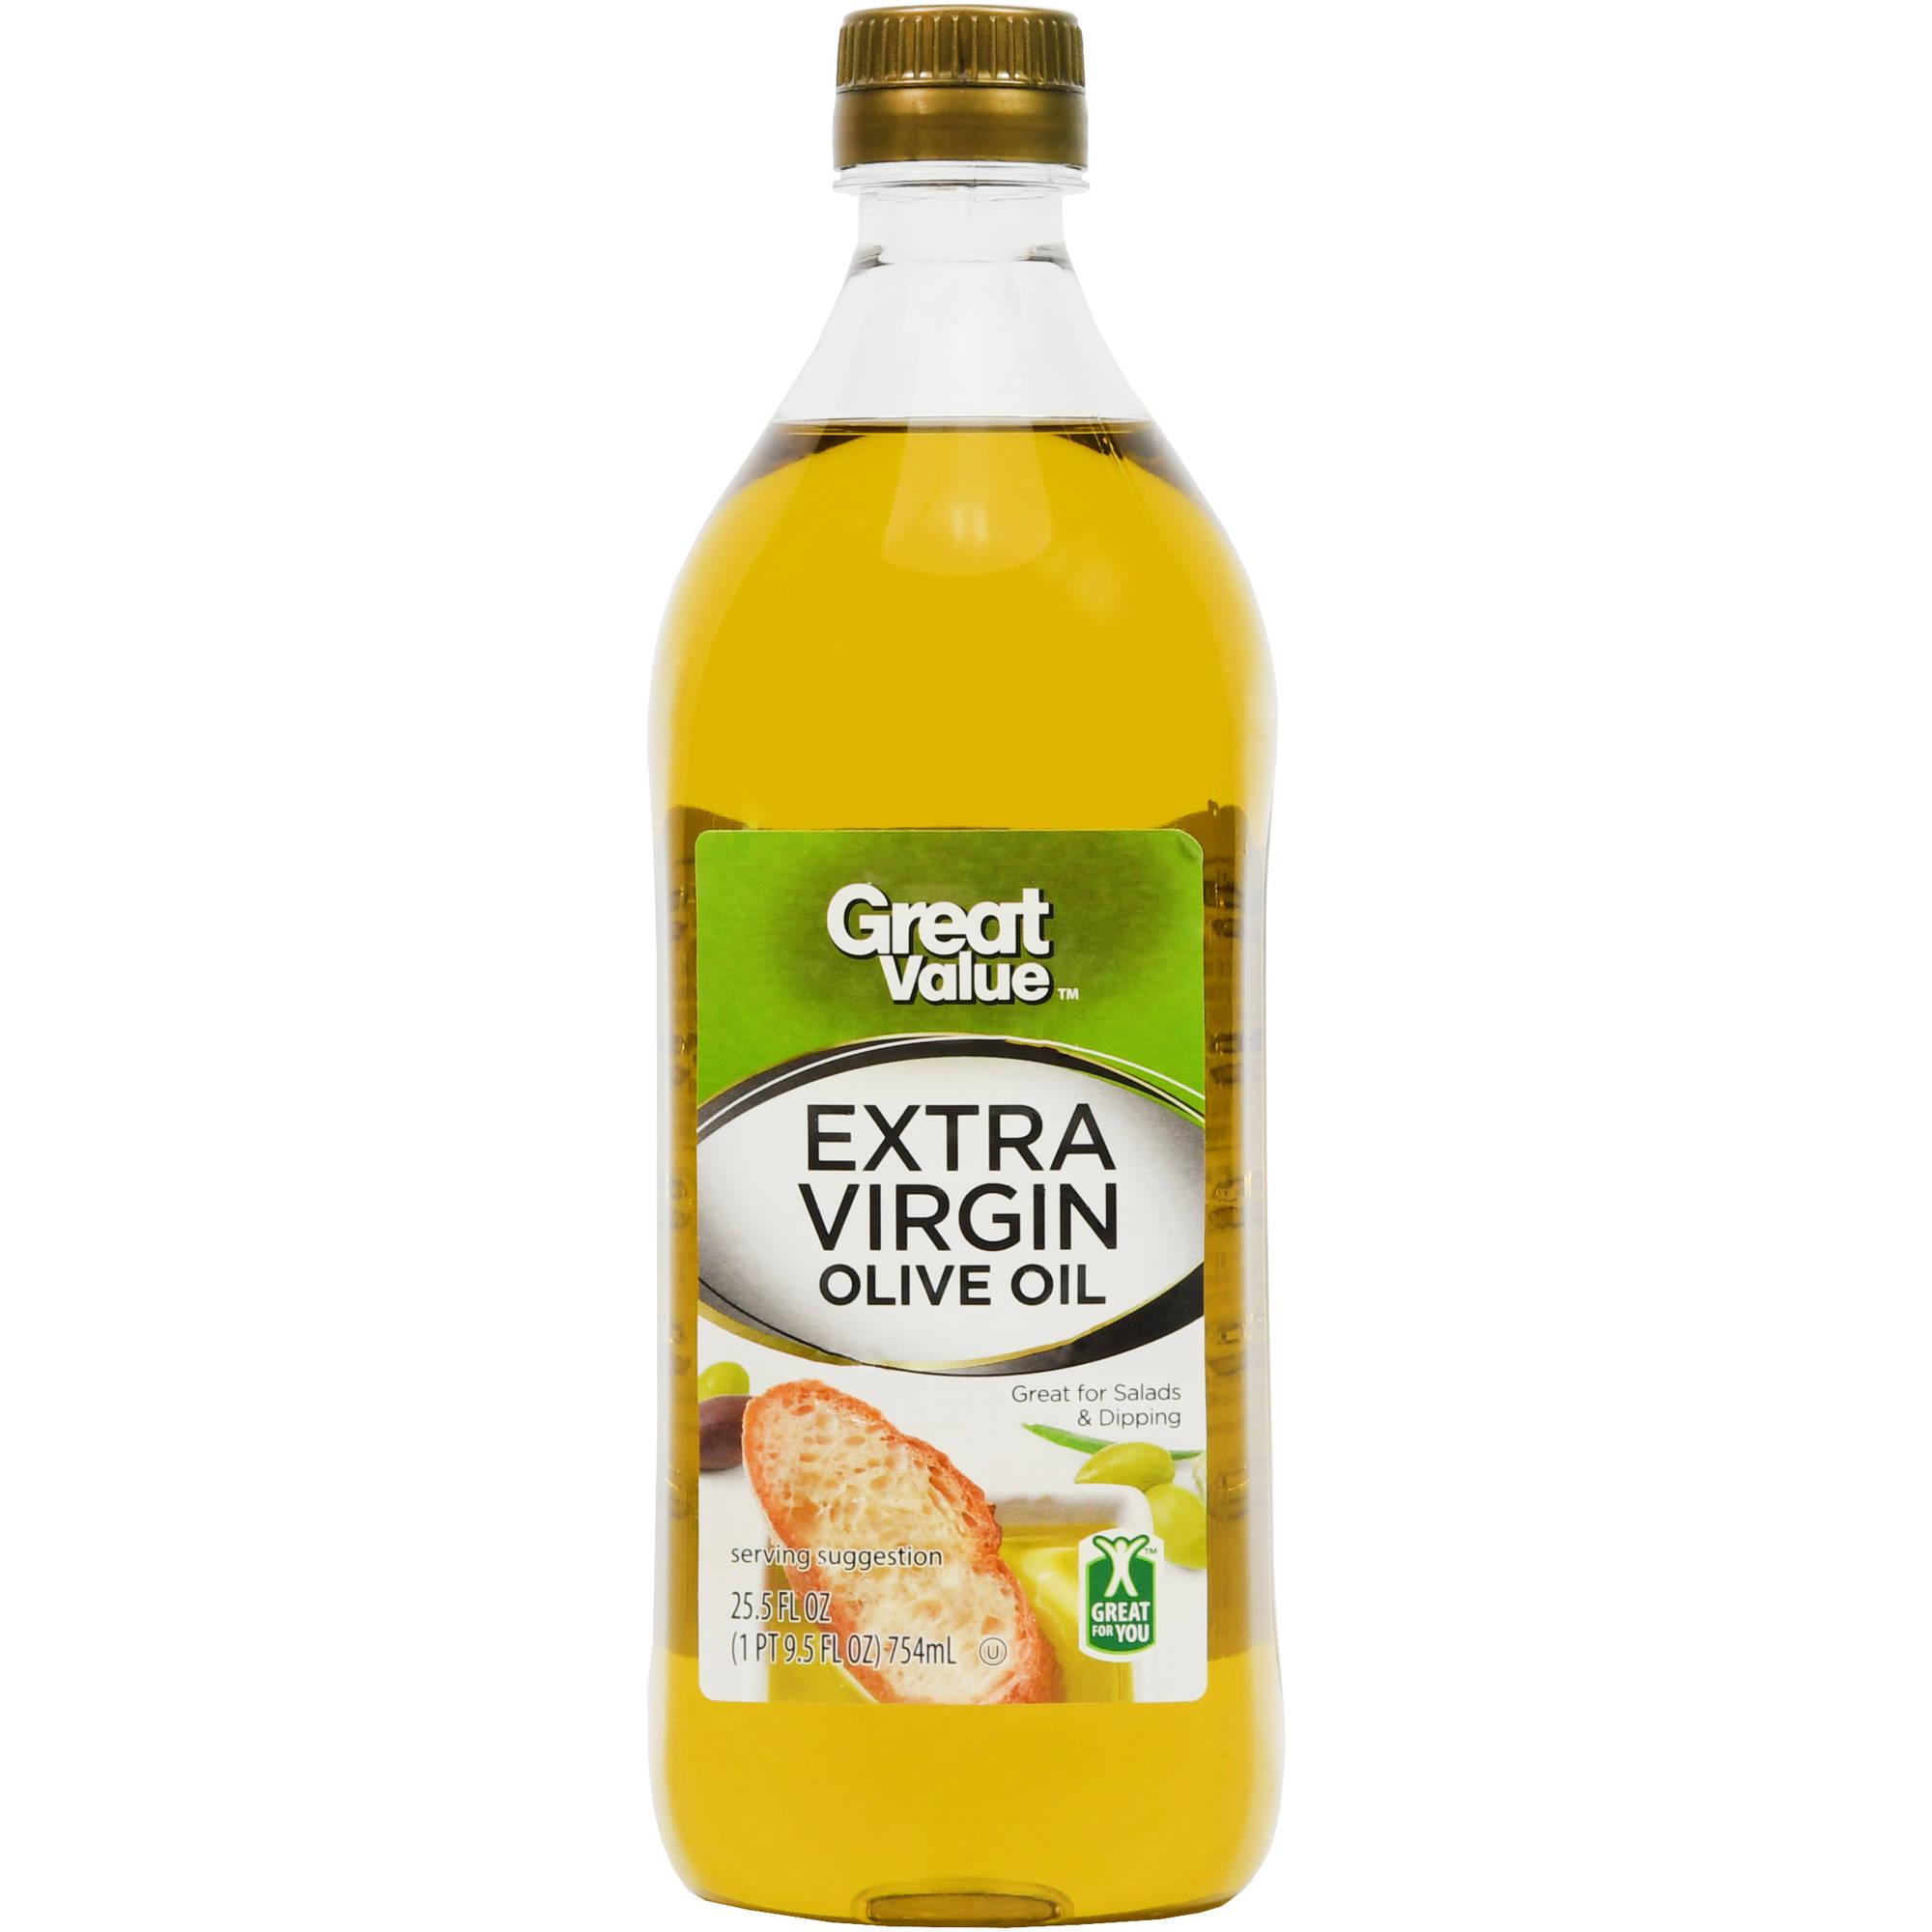 Great Value: 100% Extra Virgin Olive Oil, 25.5 oz